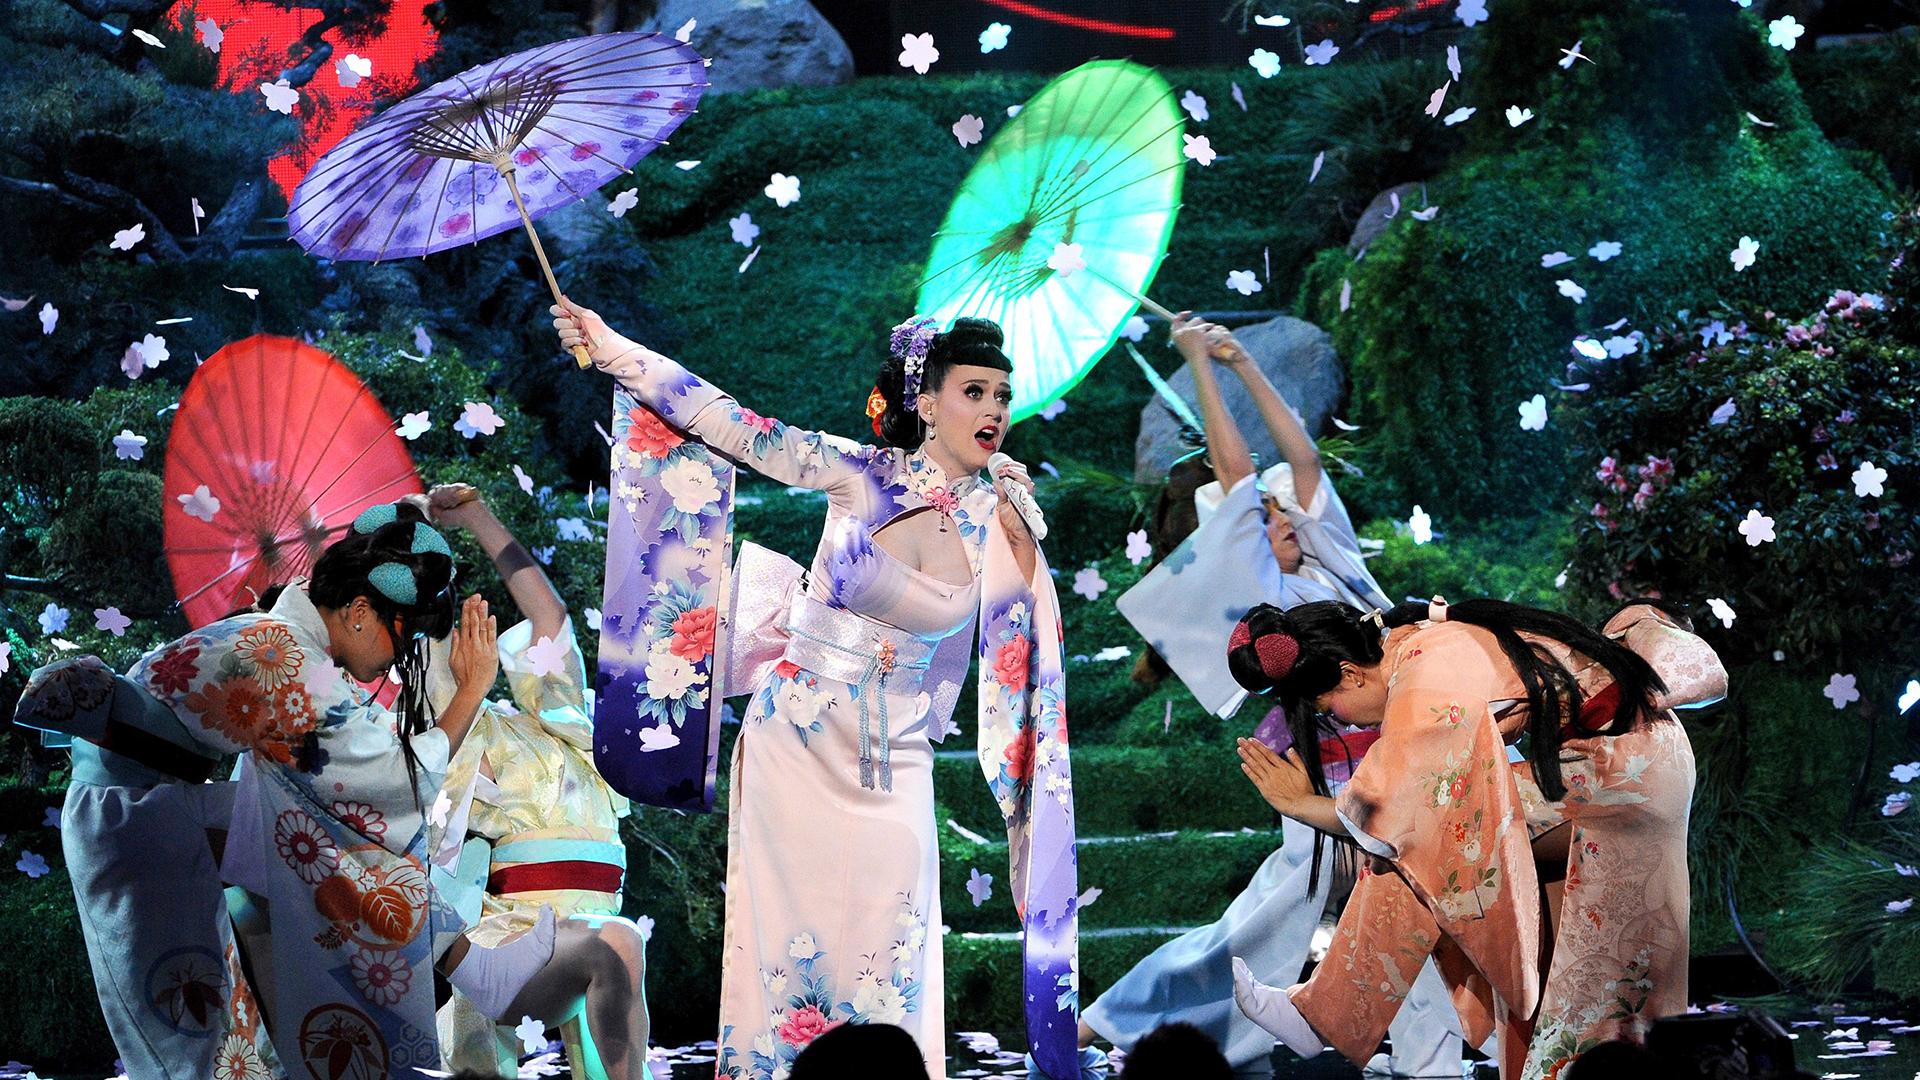 Can an American become a geisha?